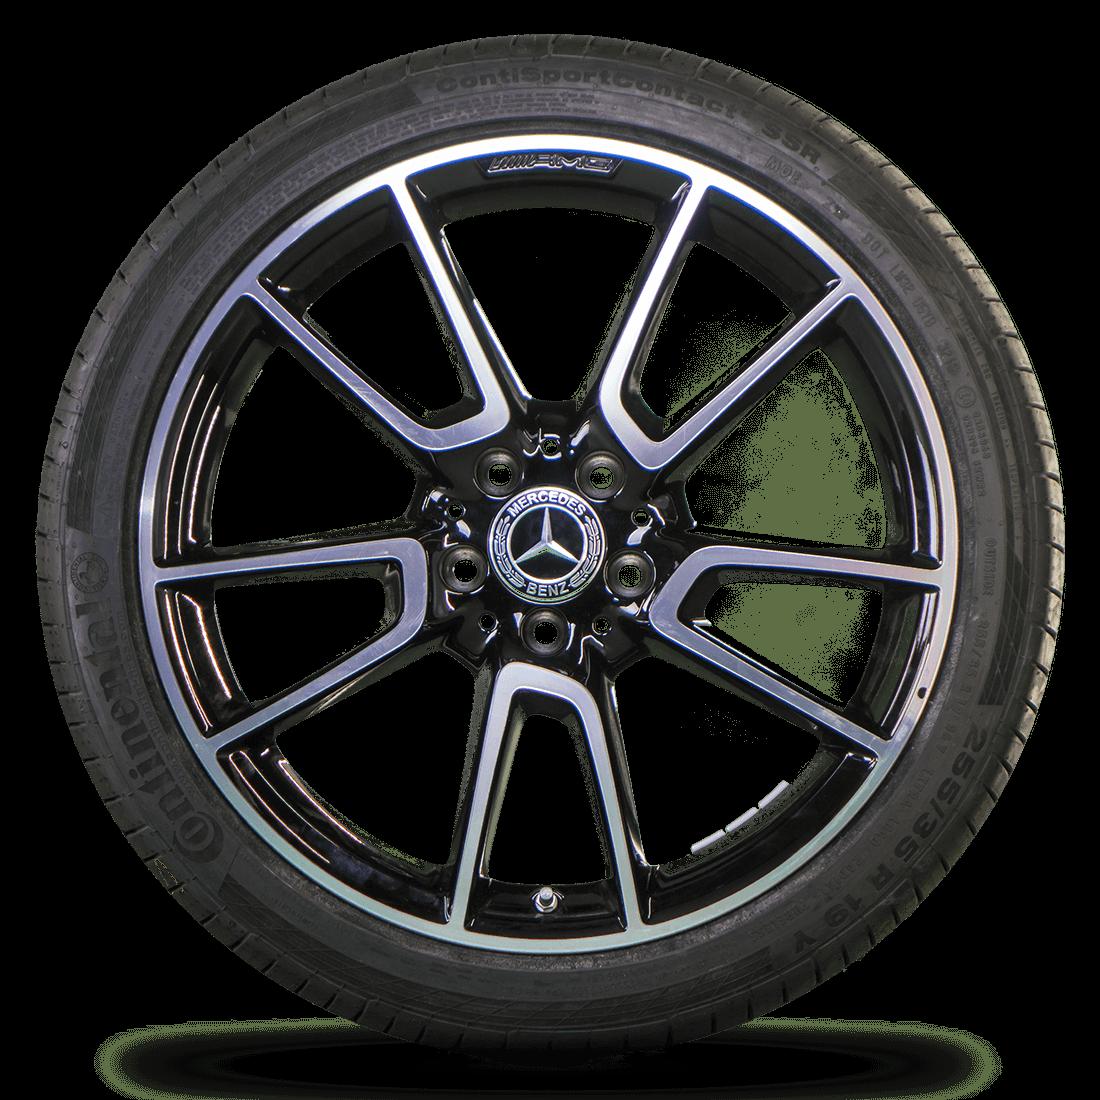 AMG 19 inch rims Mercedes Benz C43 450 Sport W205 summer tires summer wheels